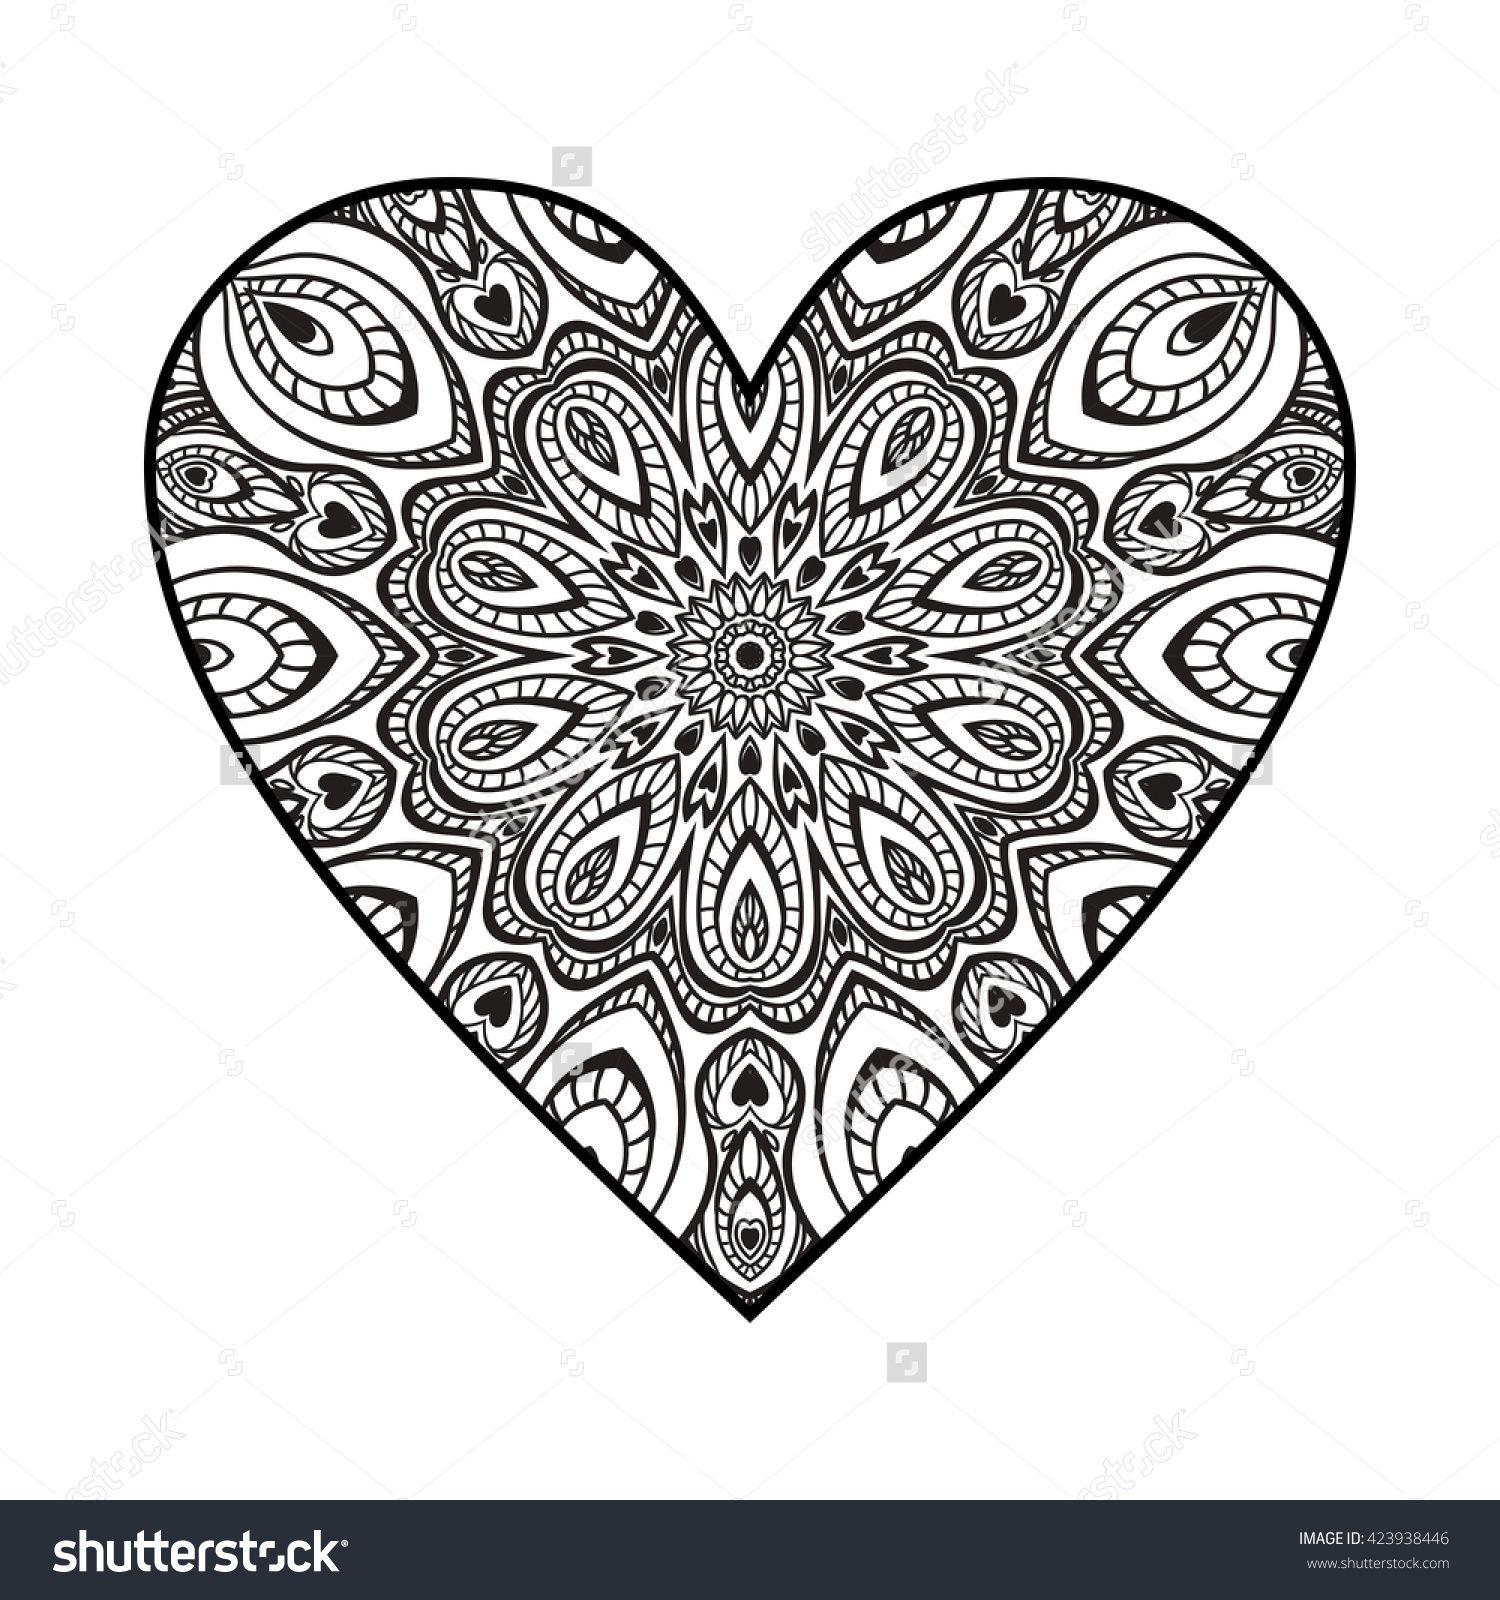 ornate heart. mandala pattern. | Coloring | Pinterest | Mandala and ...